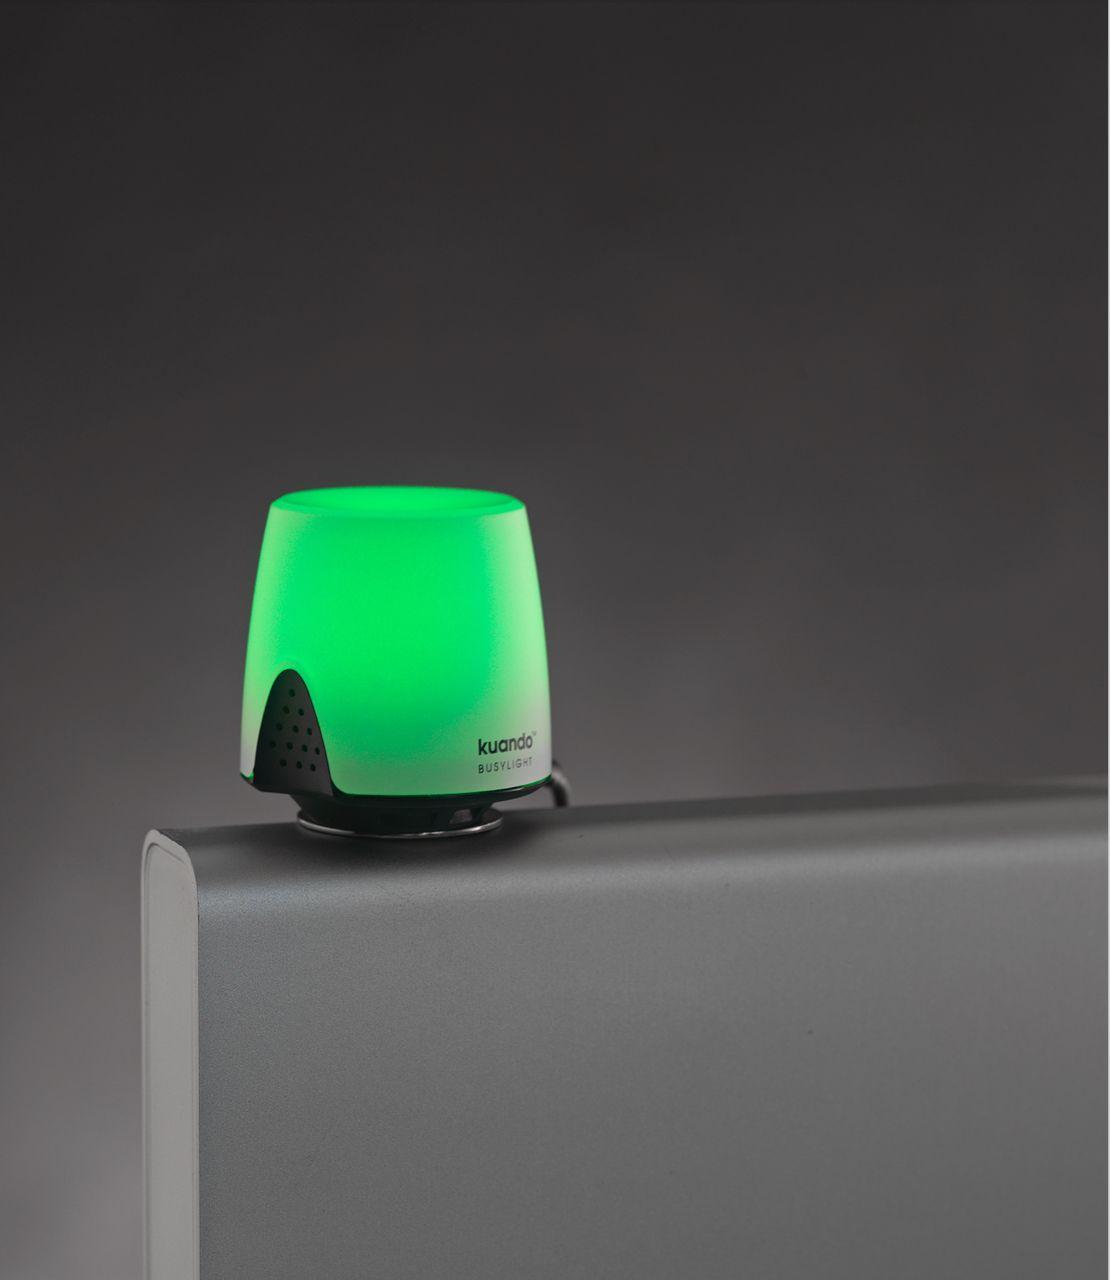 Kuando Busylight Omega viser grøn med en selvklæbende fod på en skærm